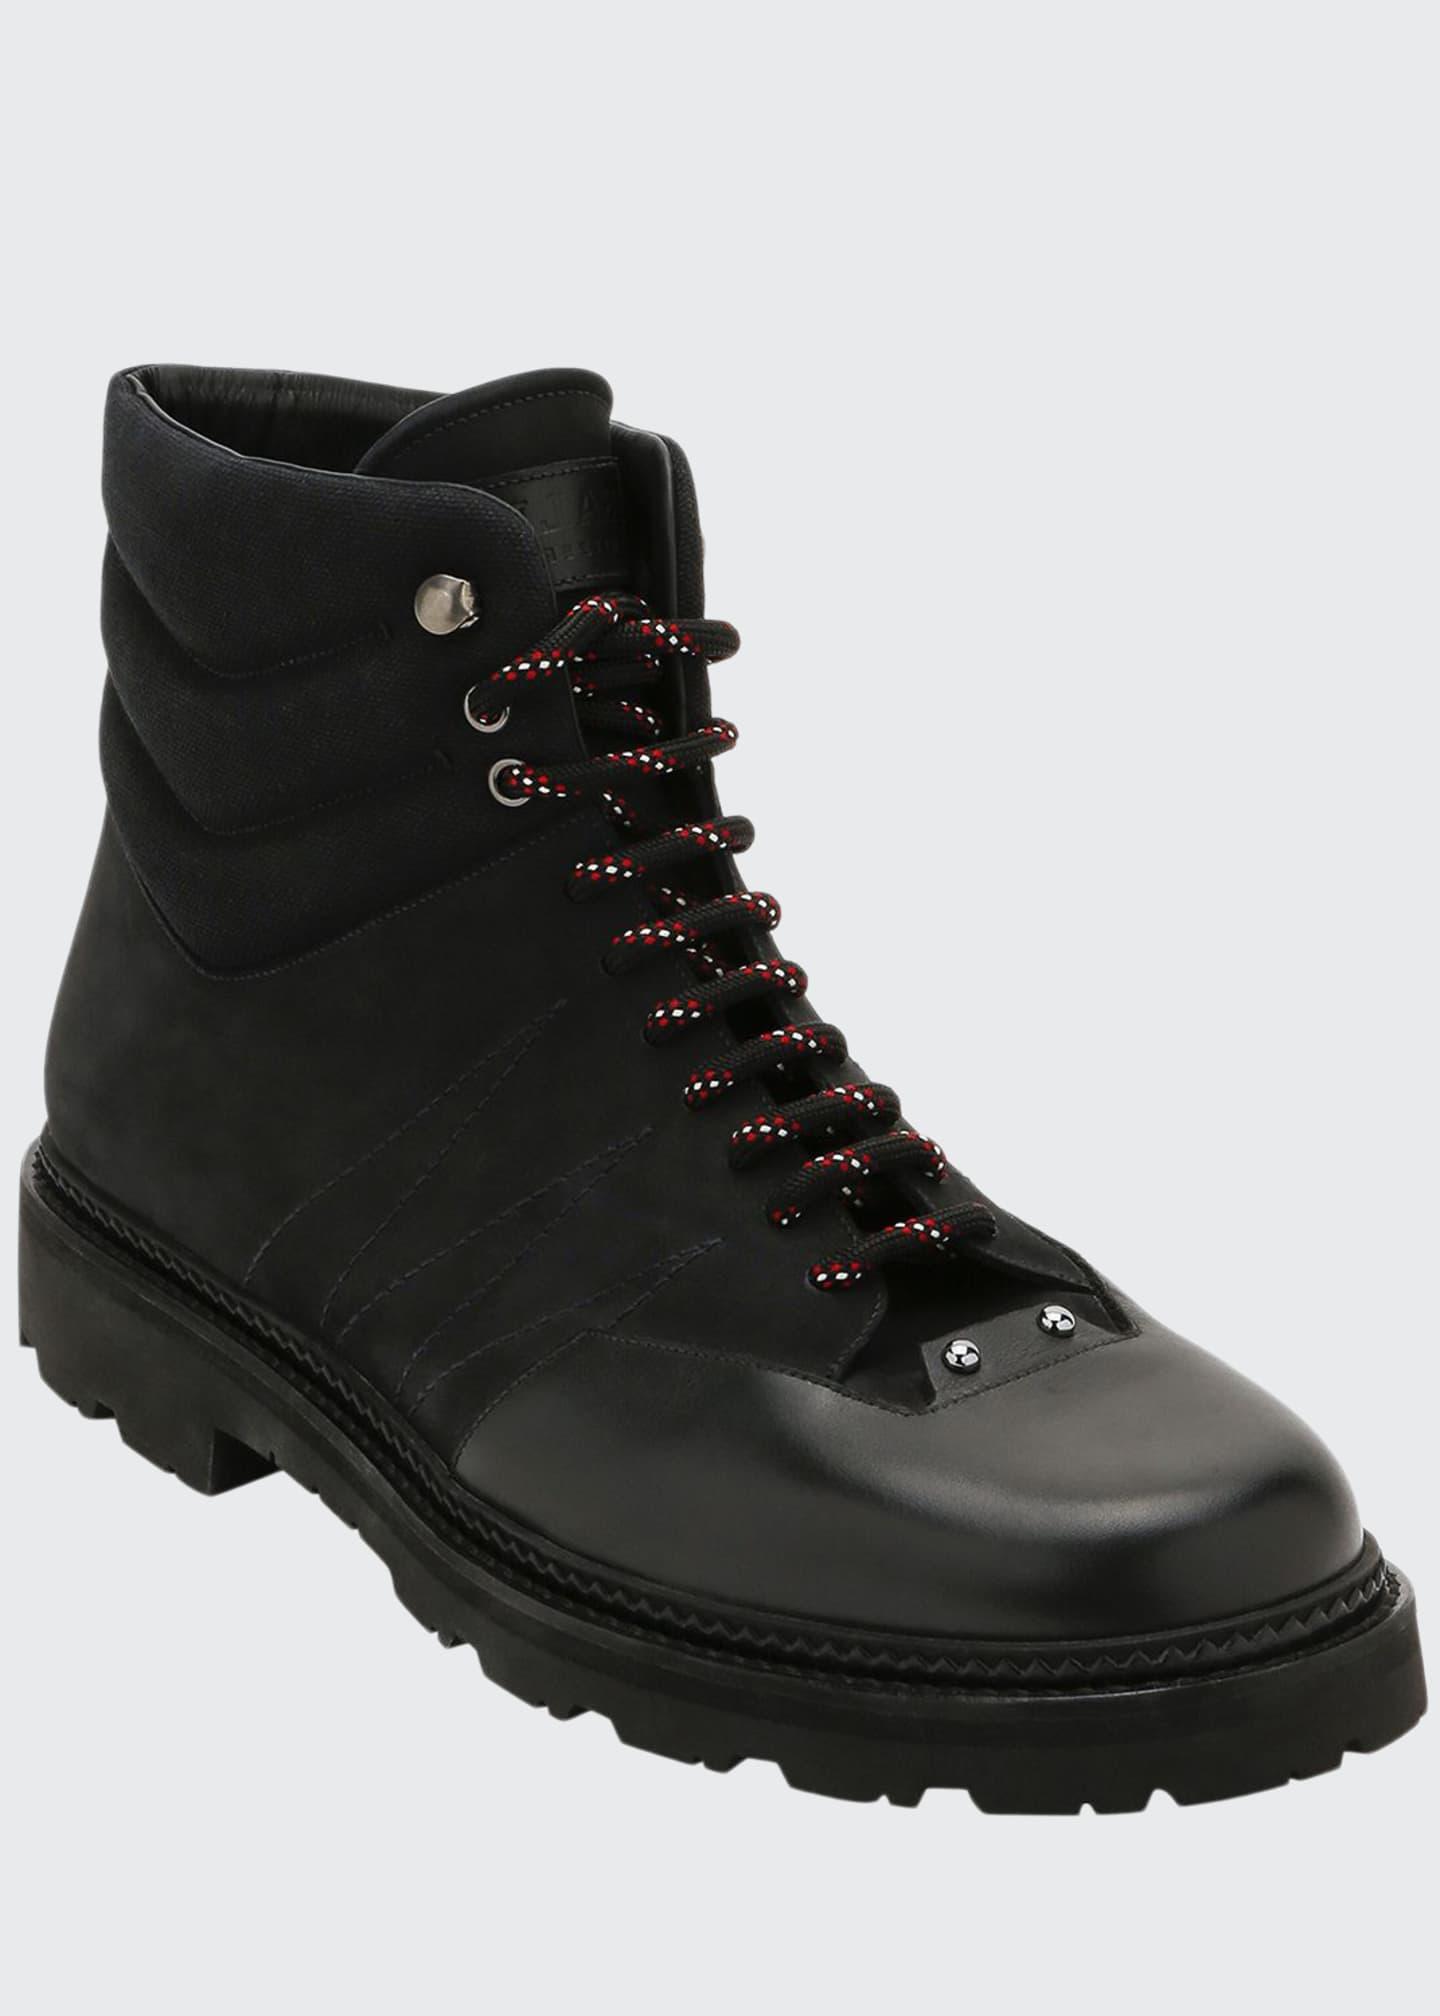 Bally Men's Zeber Tonal Mixed-Media Hiking Boots